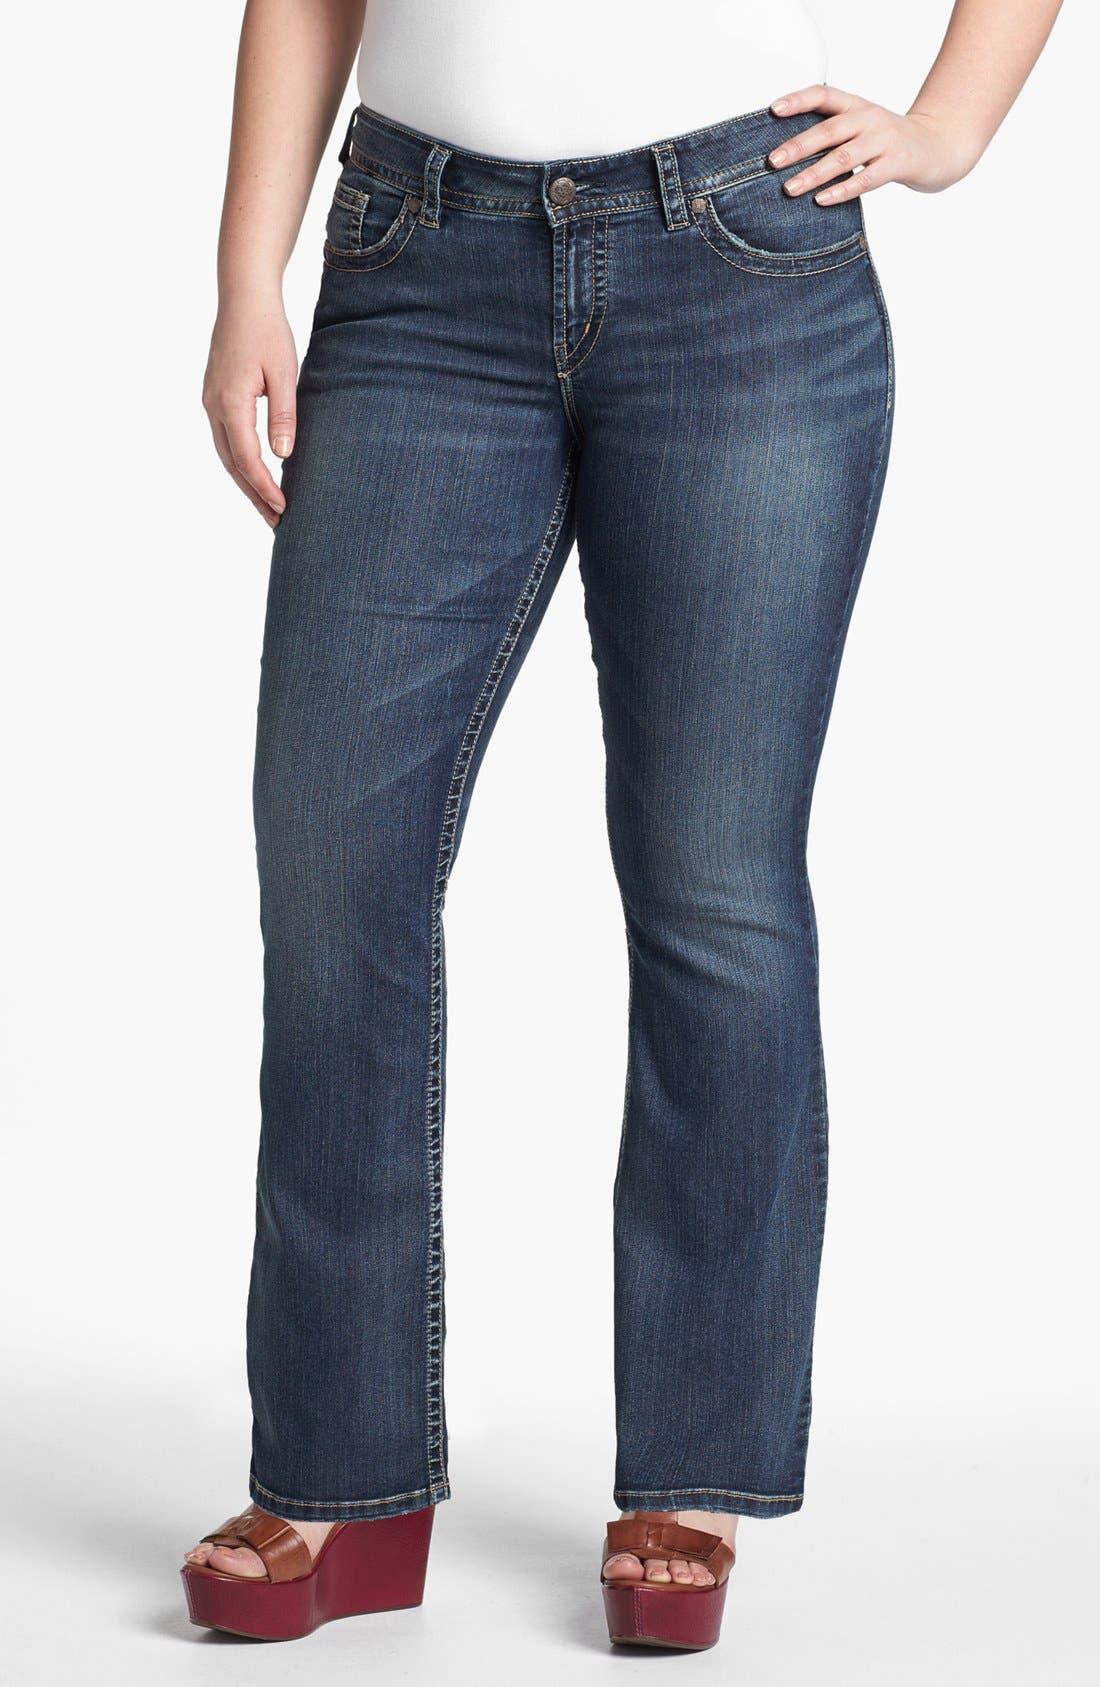 Alternate Image 1 Selected - Silver Jeans Co. 'Suki' Bootcut Jeans (Juniors Plus)